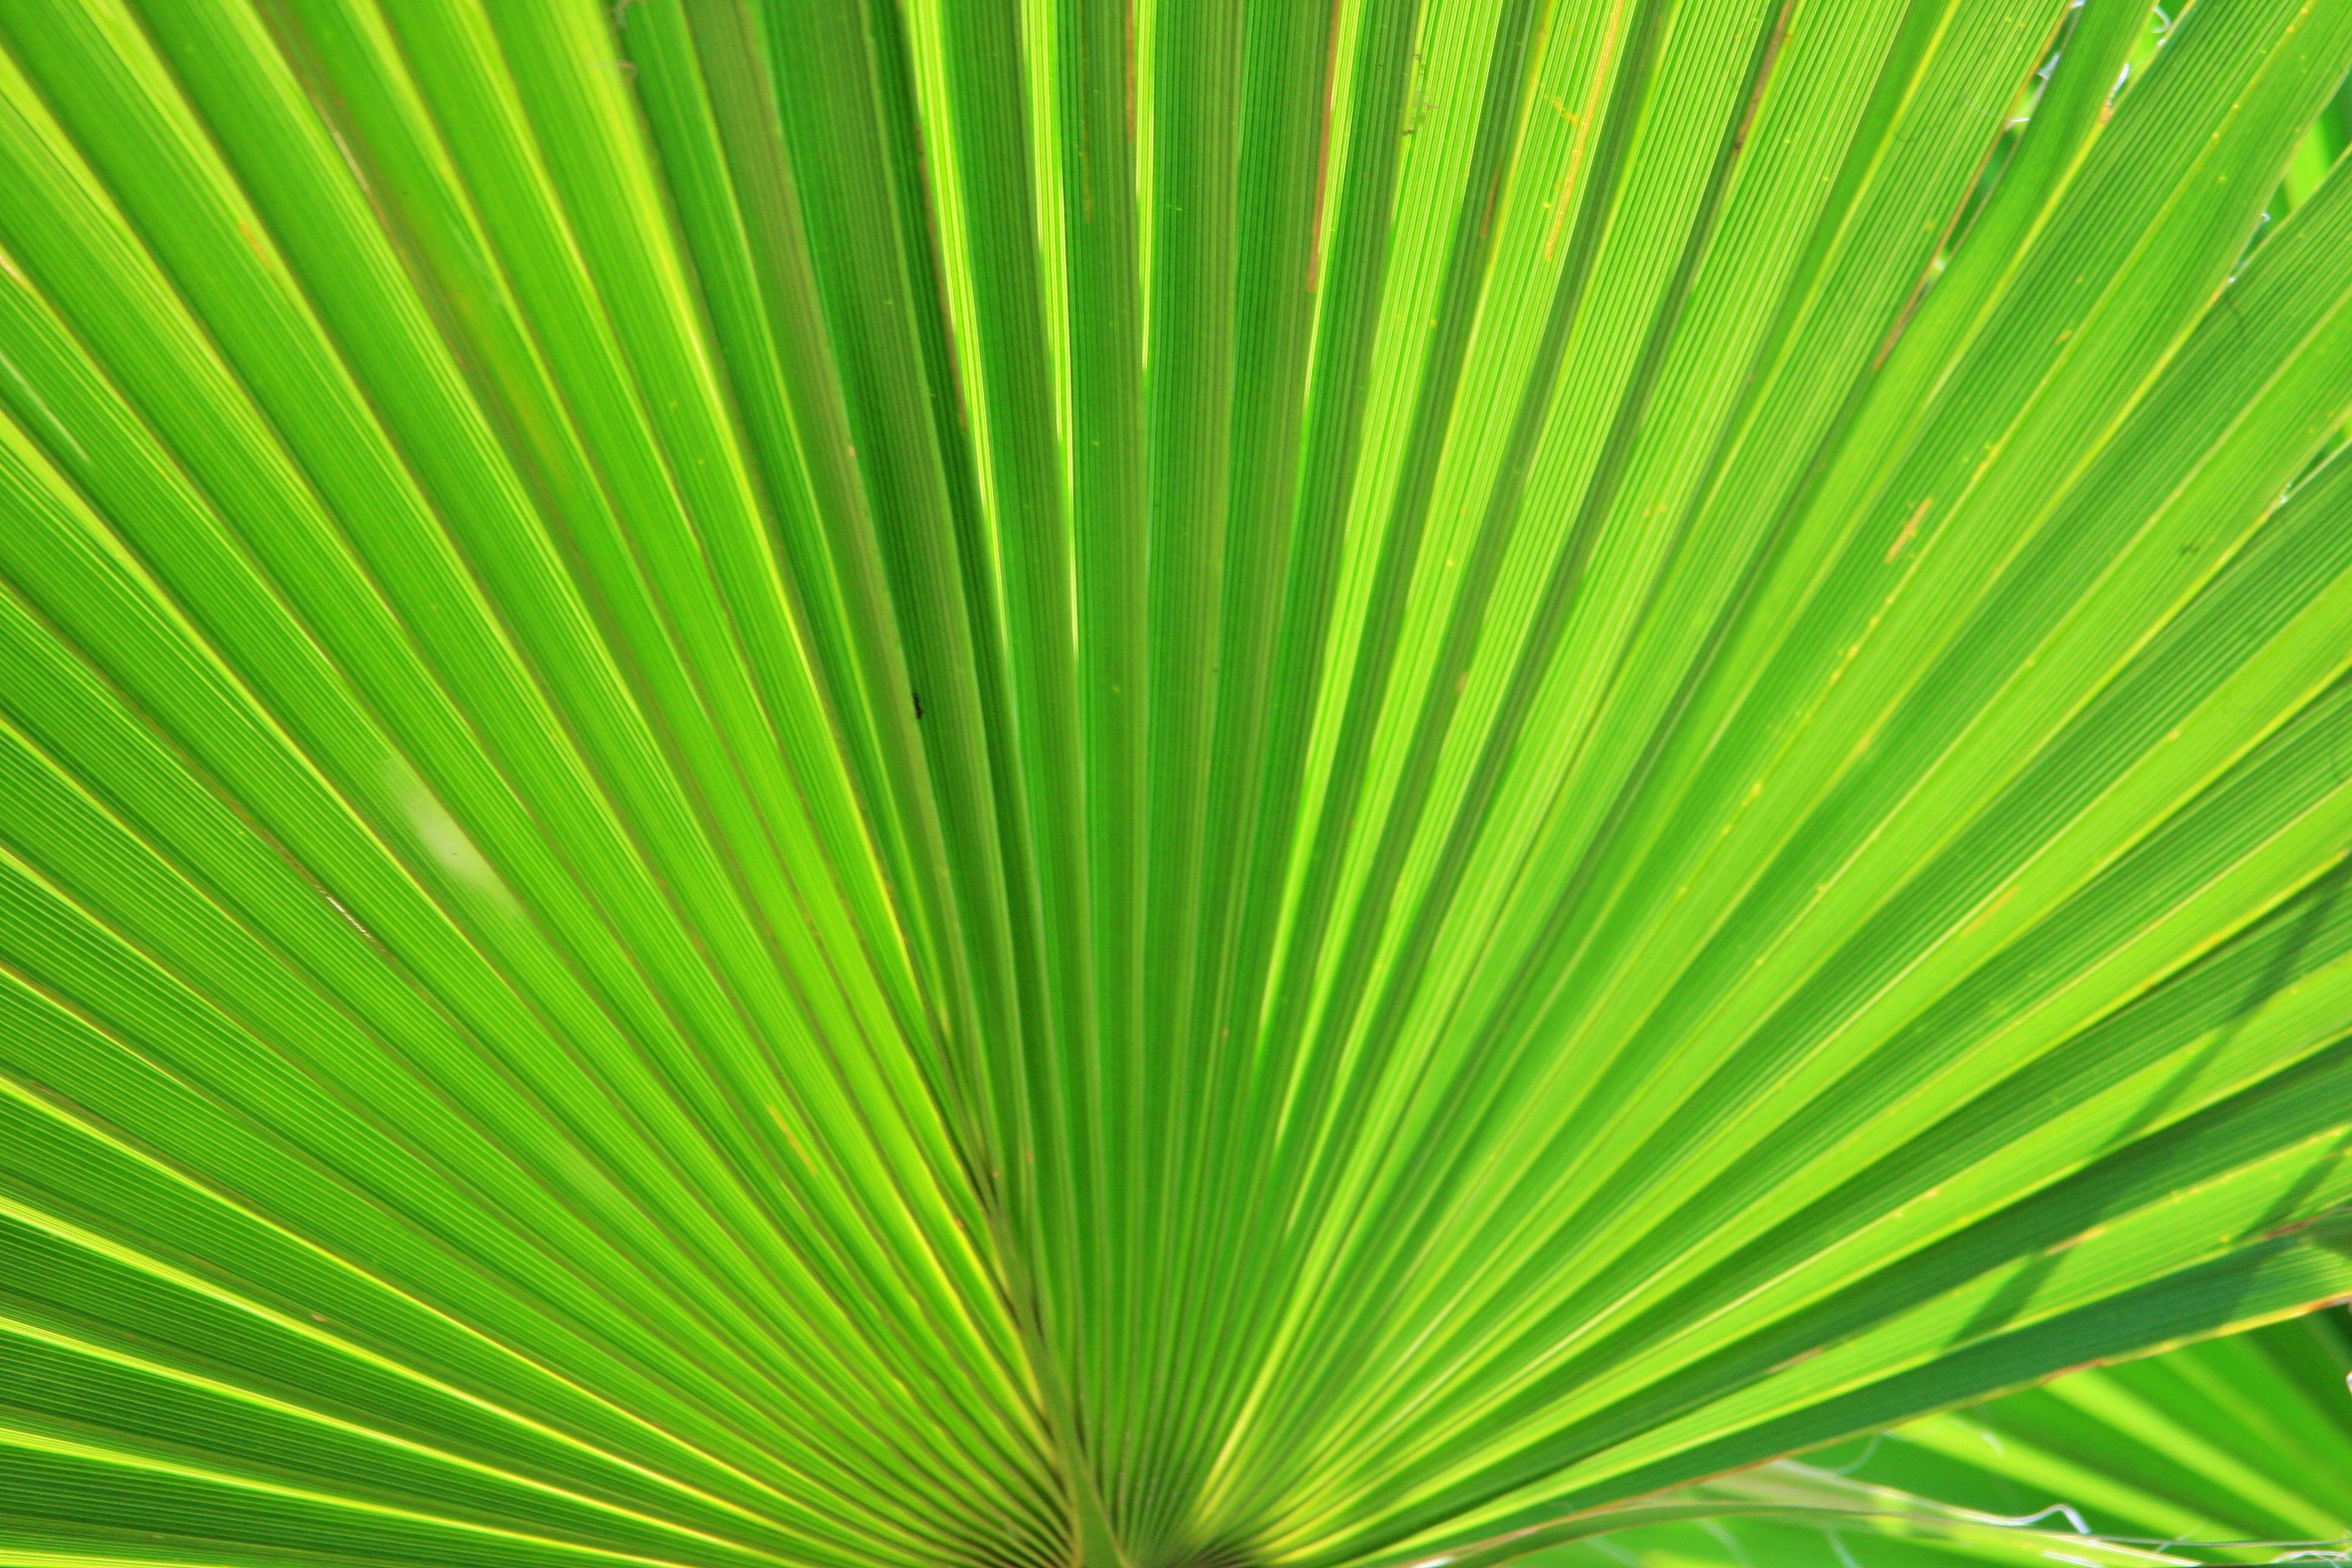 Kostenloses Stock Foto zu fächerpalme, grün, pflanze